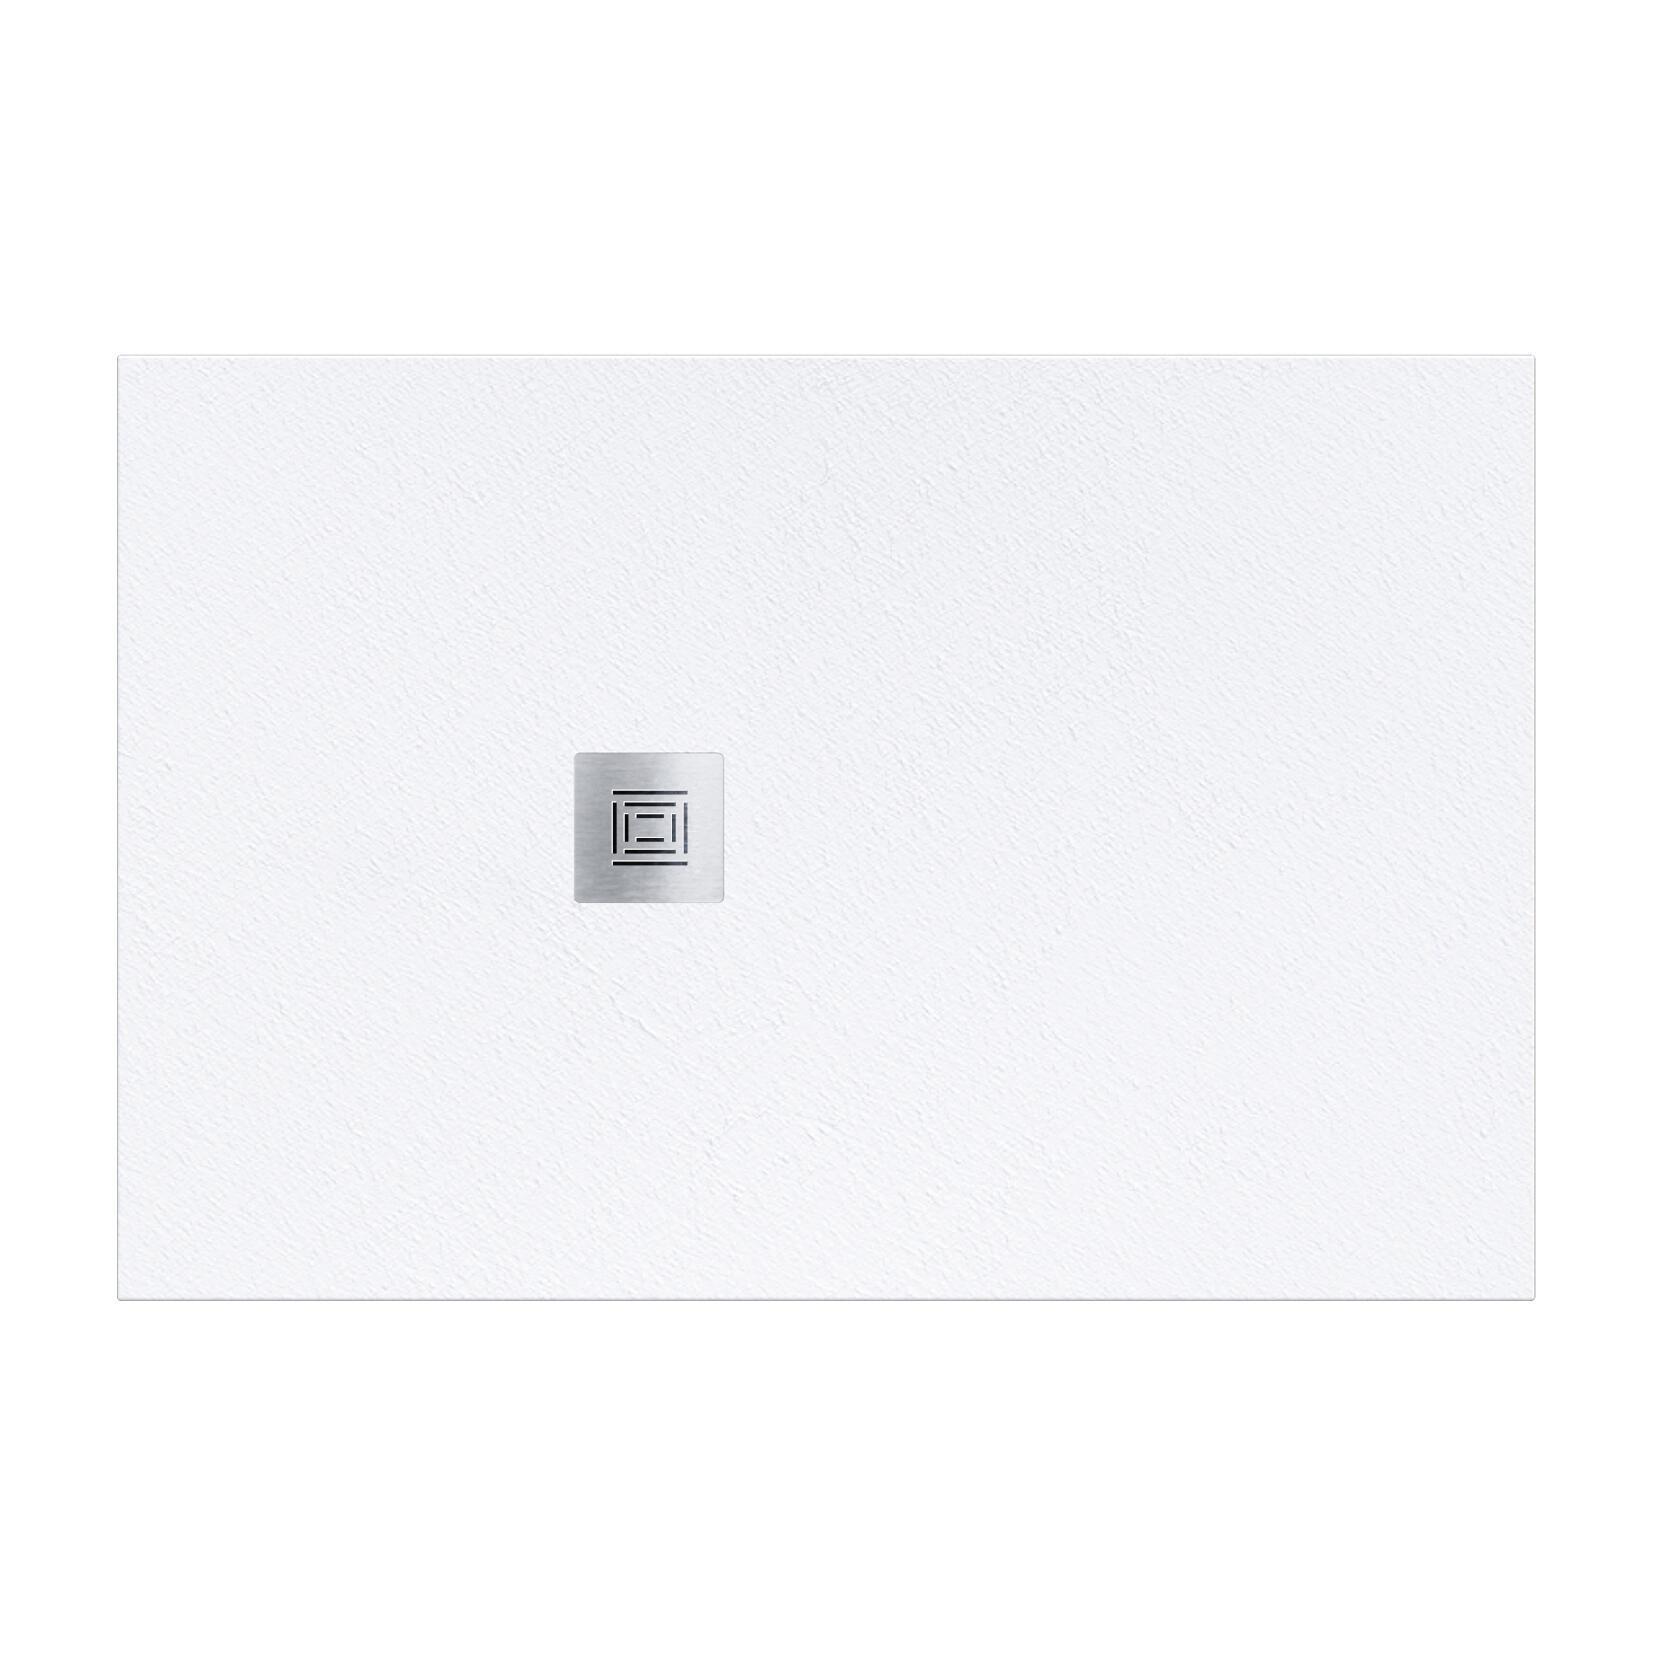 Piatto doccia resina Logic 70 x 120 cm bianco - 1